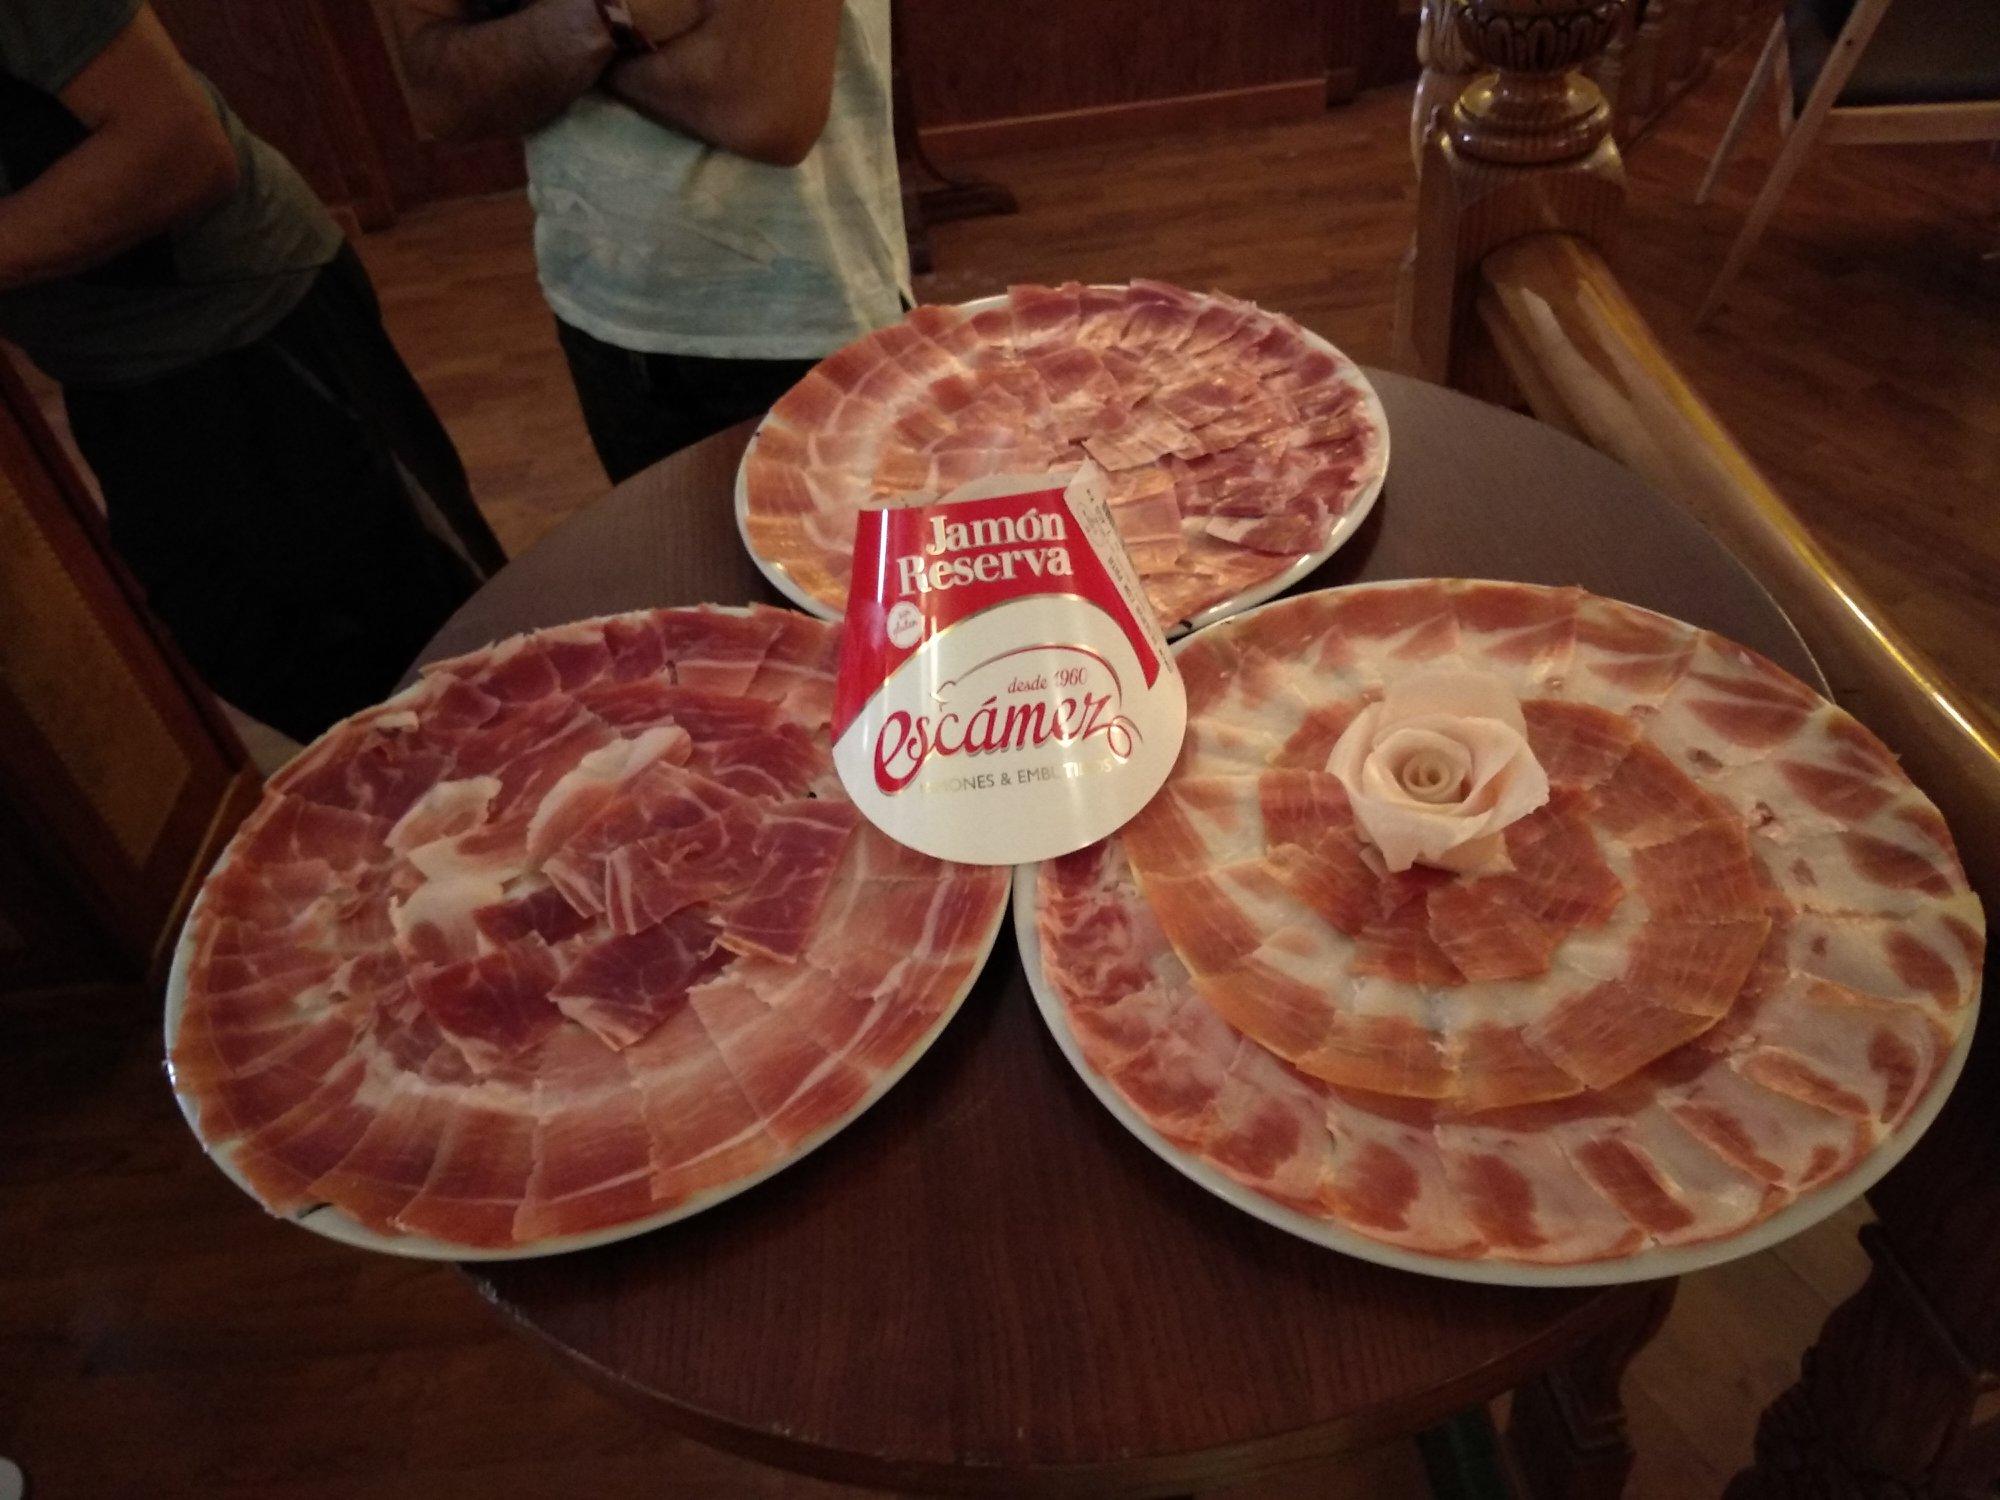 Presentación de tres platos de jamón al corte cuchillo. Finas lonchas de excelente sabor